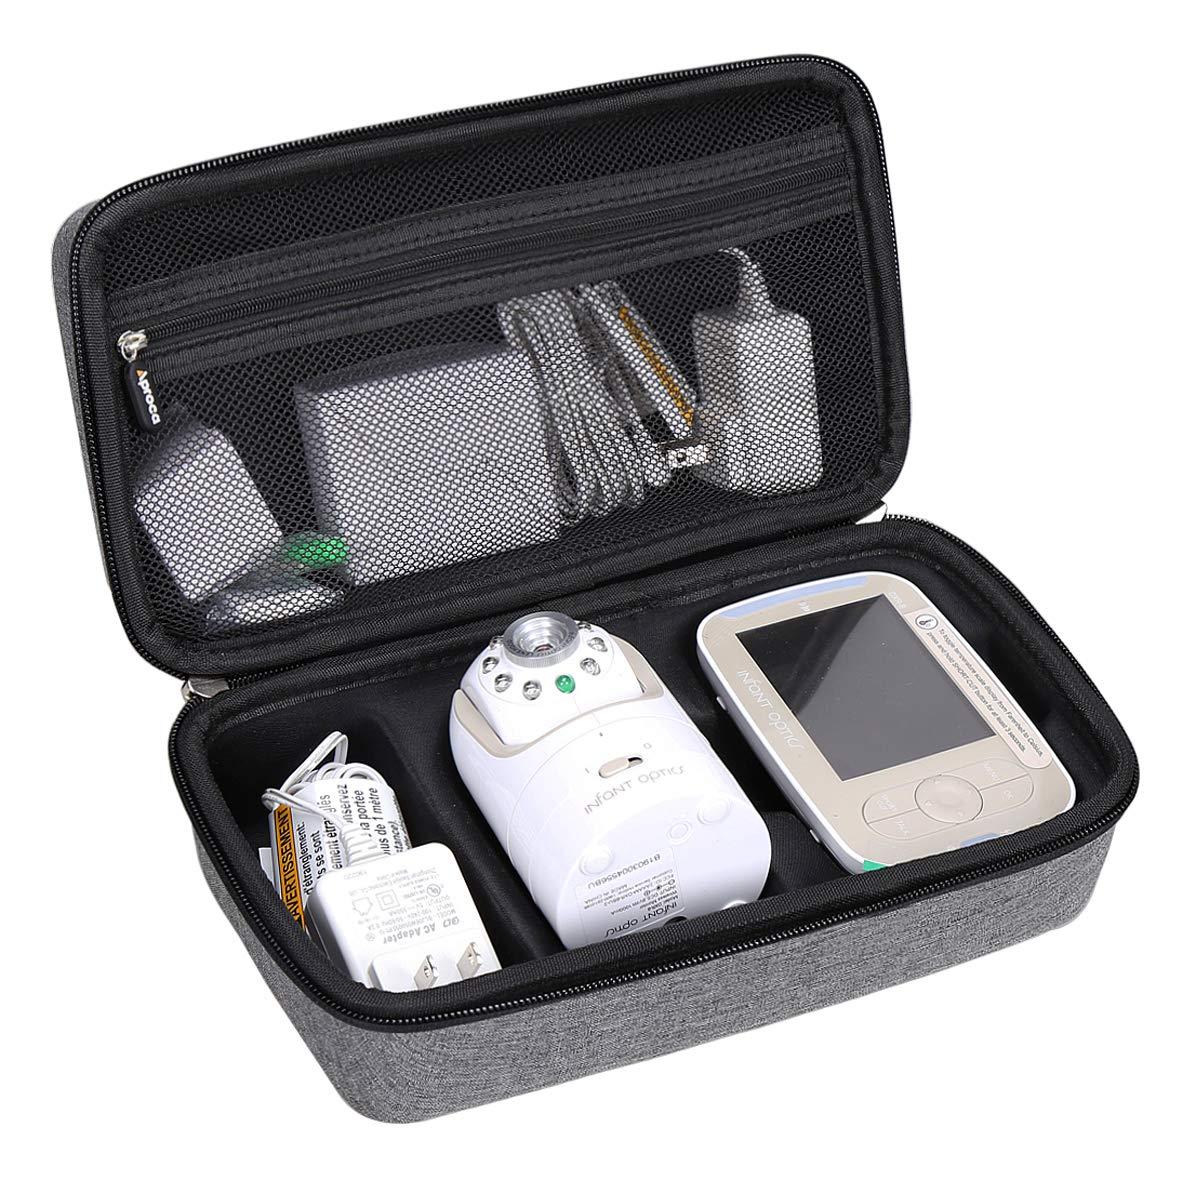 Aproca Hard Carry StorageTravel Case for Infant Optics DXR-8 Video Baby Monitor